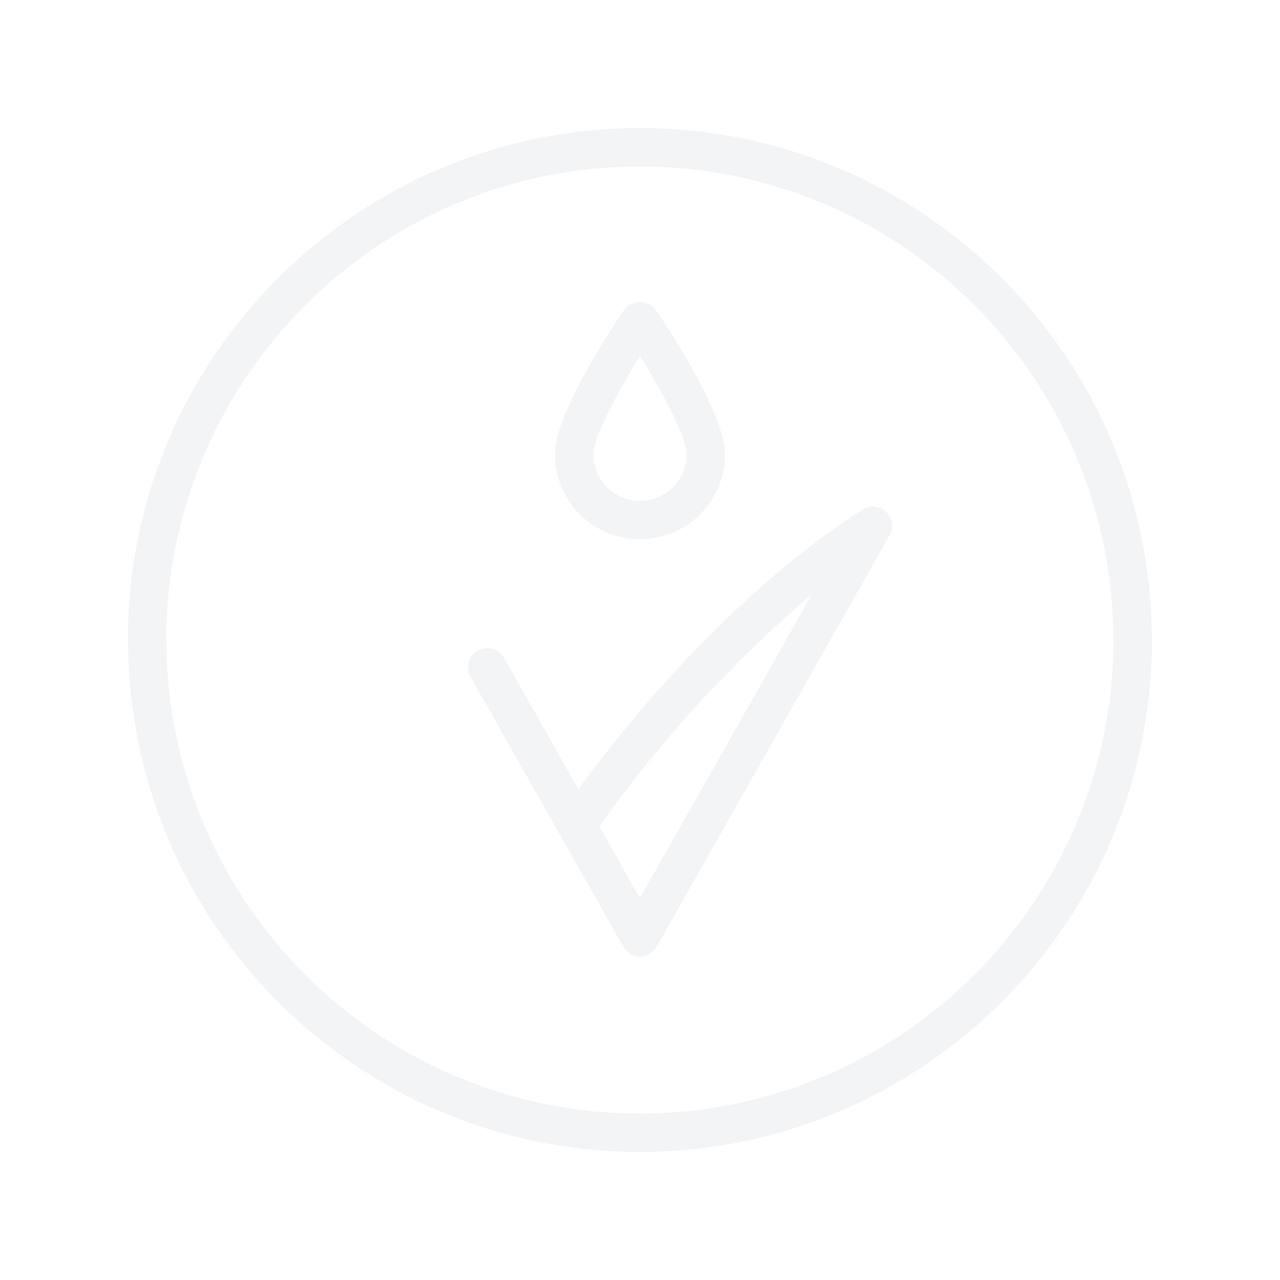 ARTDECO Eyebrow Stencils 5pcs With Brush Applicator